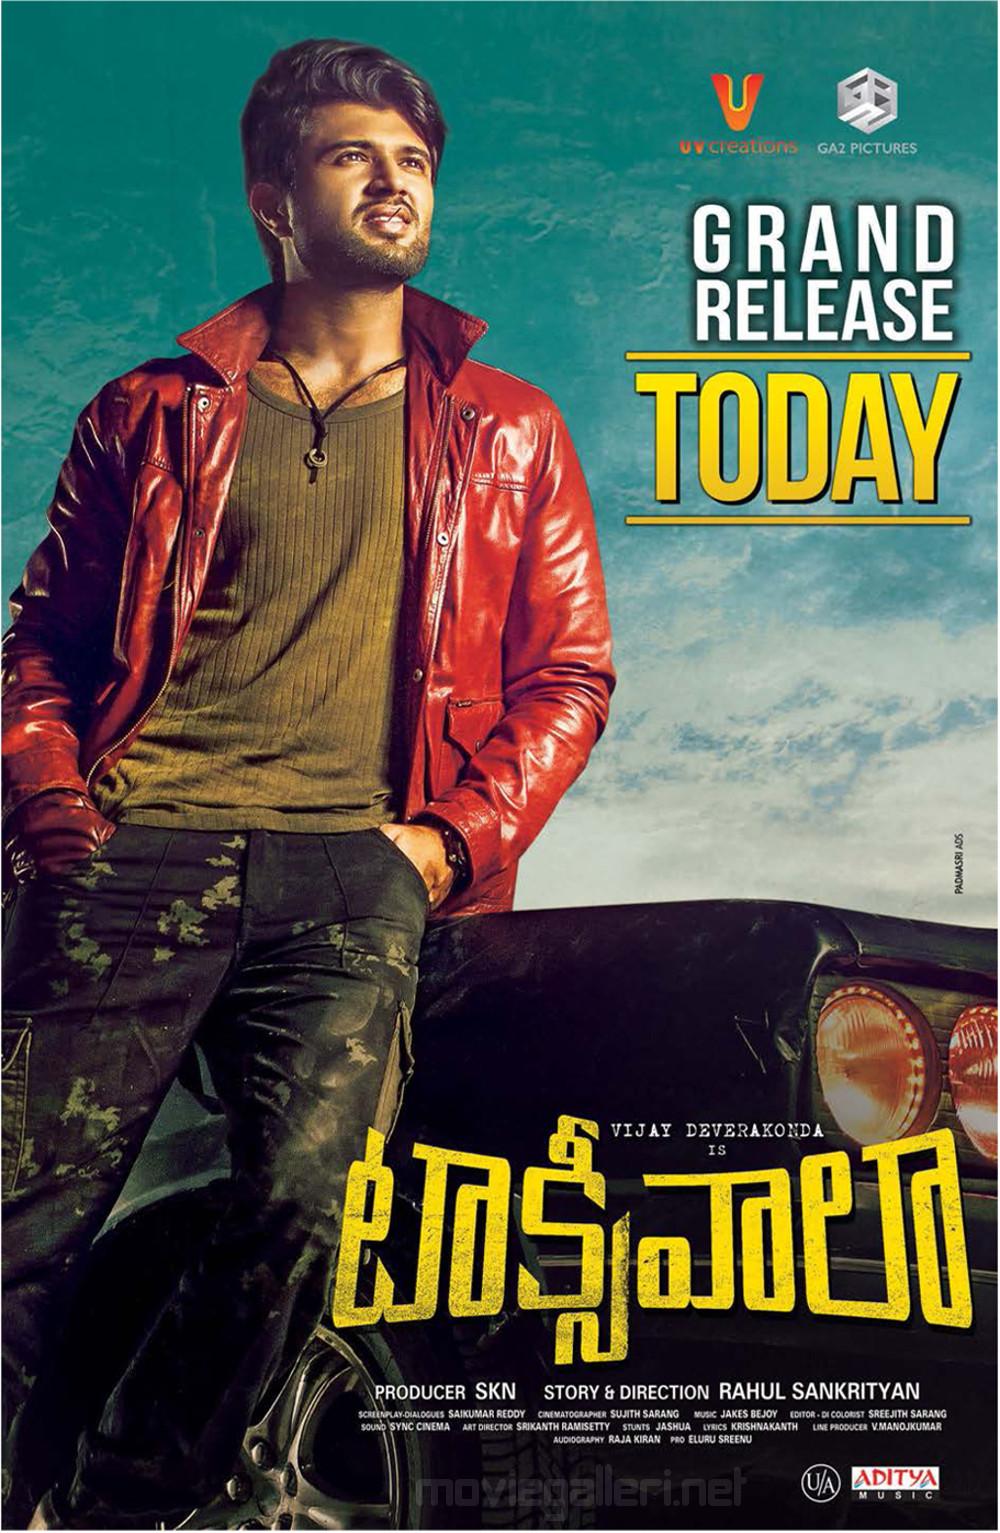 Actor Vijay Devarakonda Taxiwala Movie Release Today Posters